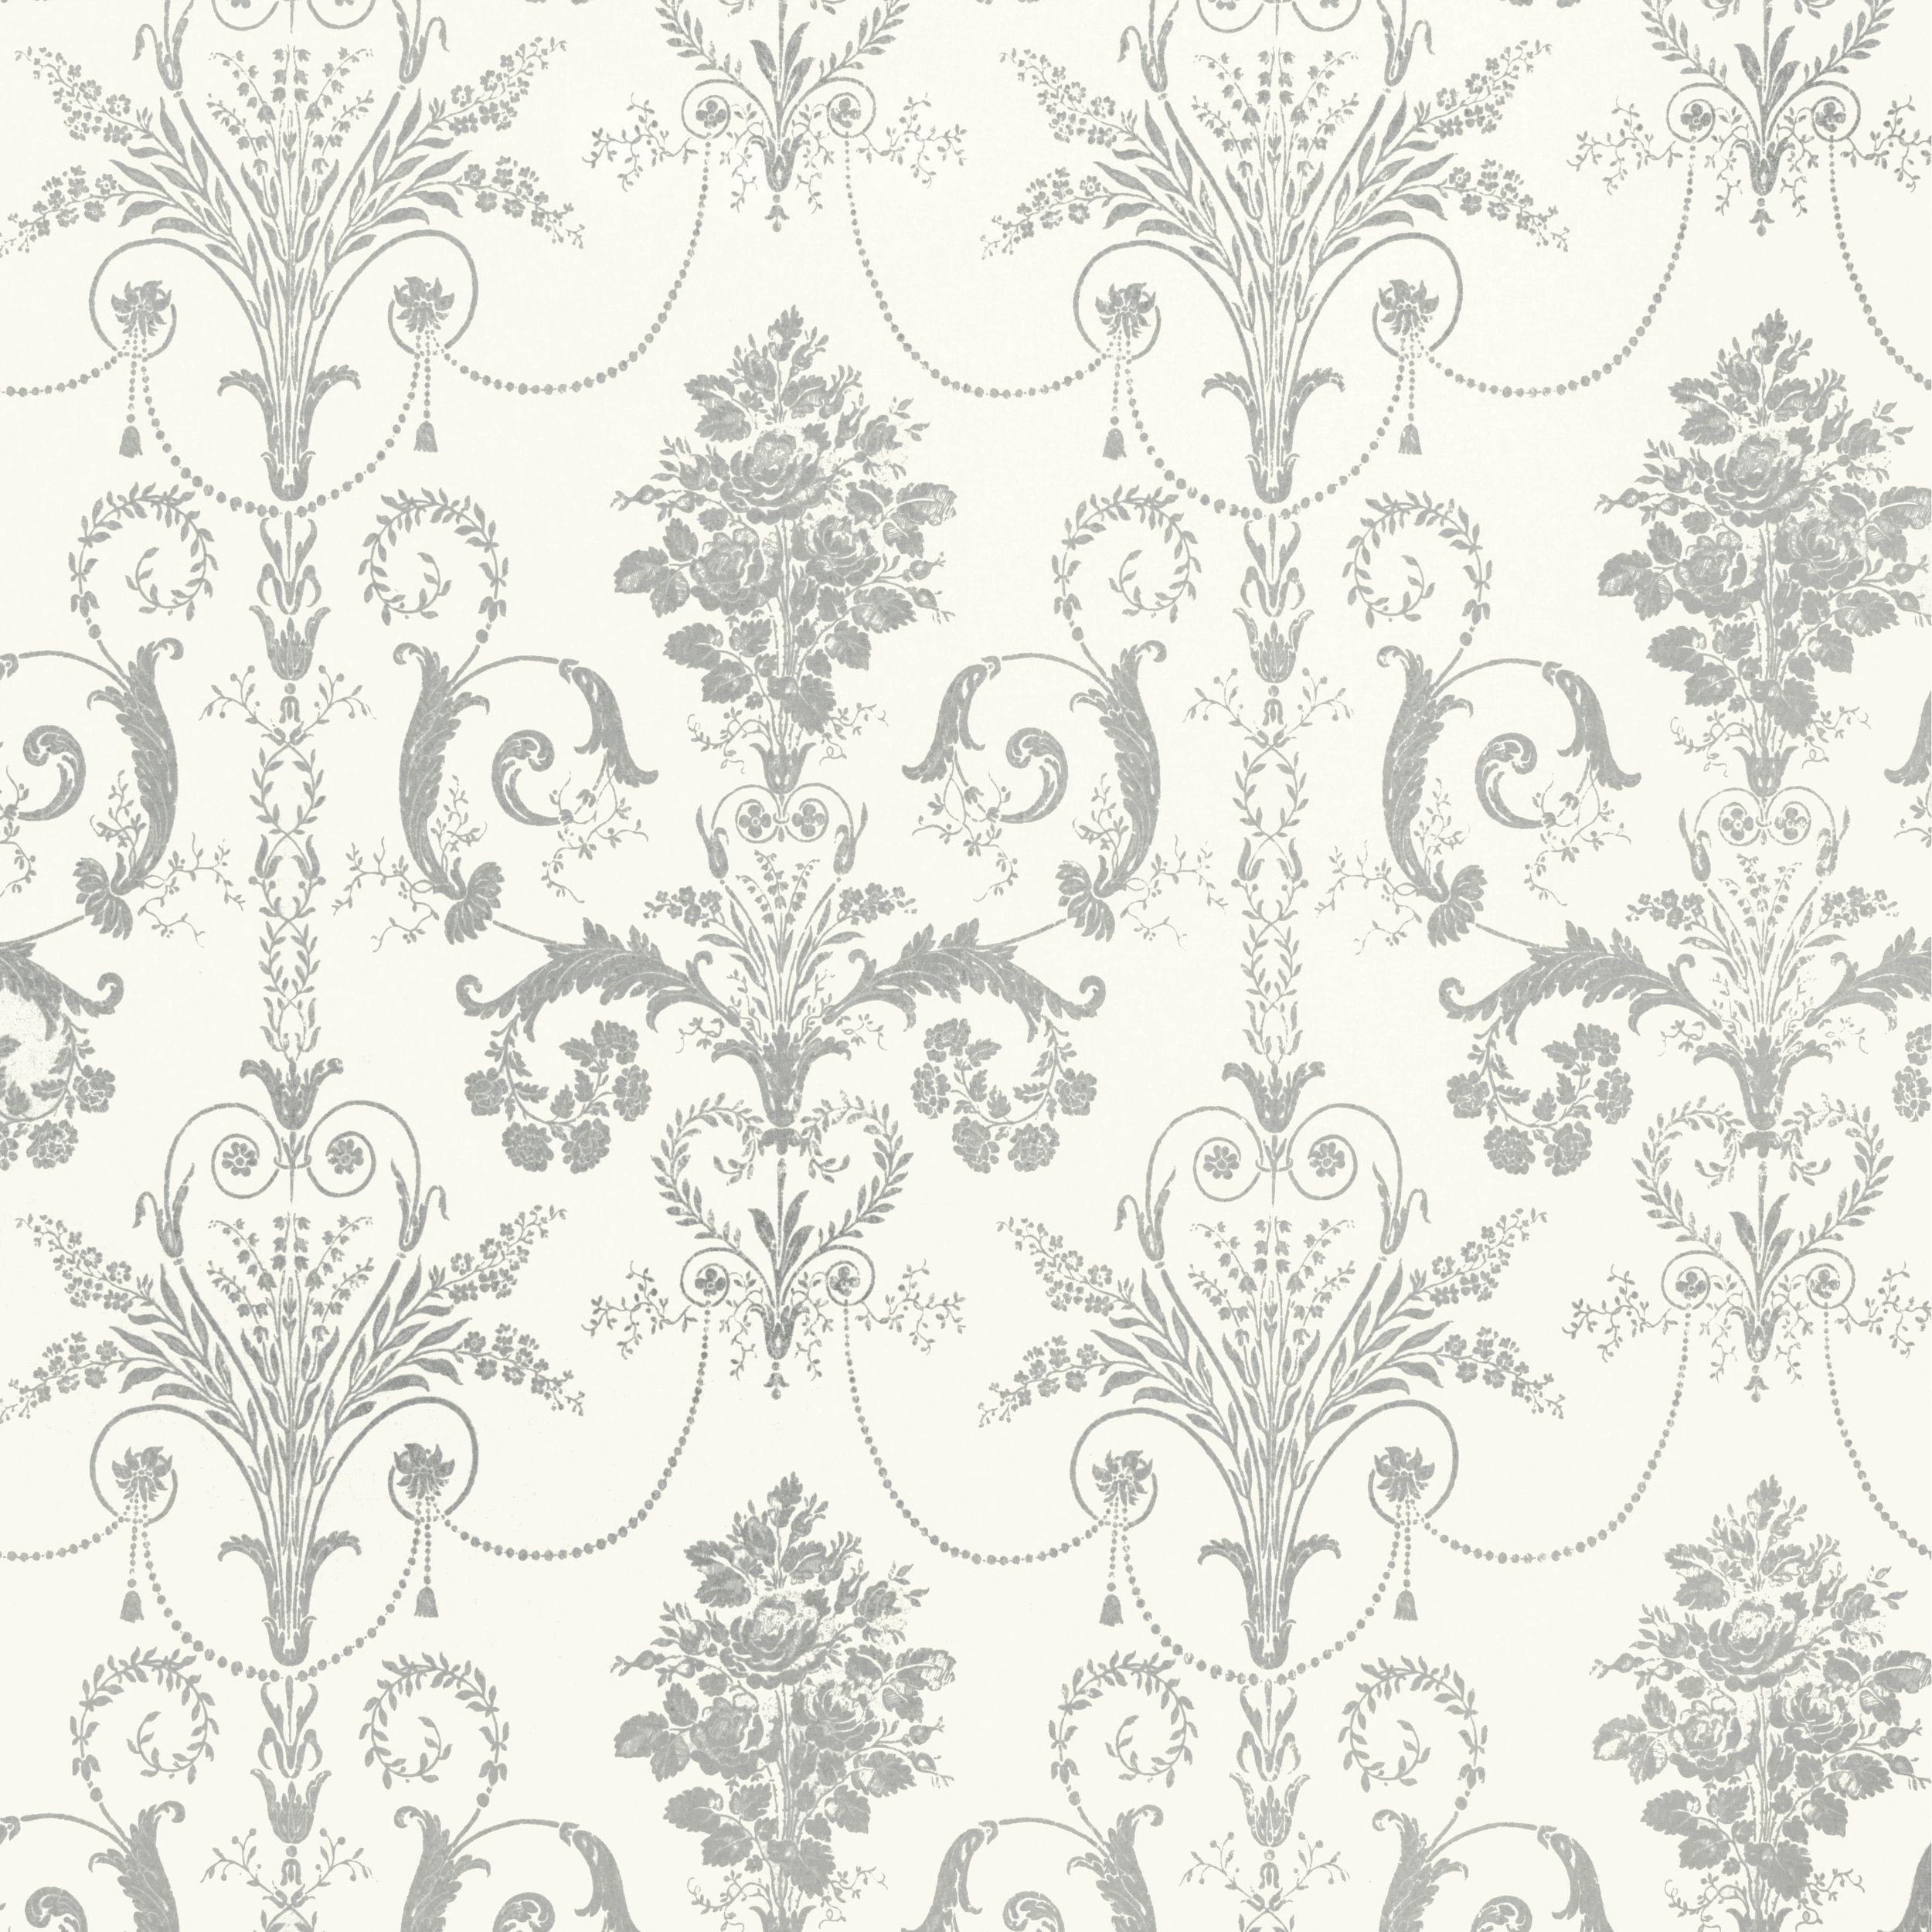 feature wall | hallway ideas | pinterest | silver glitter